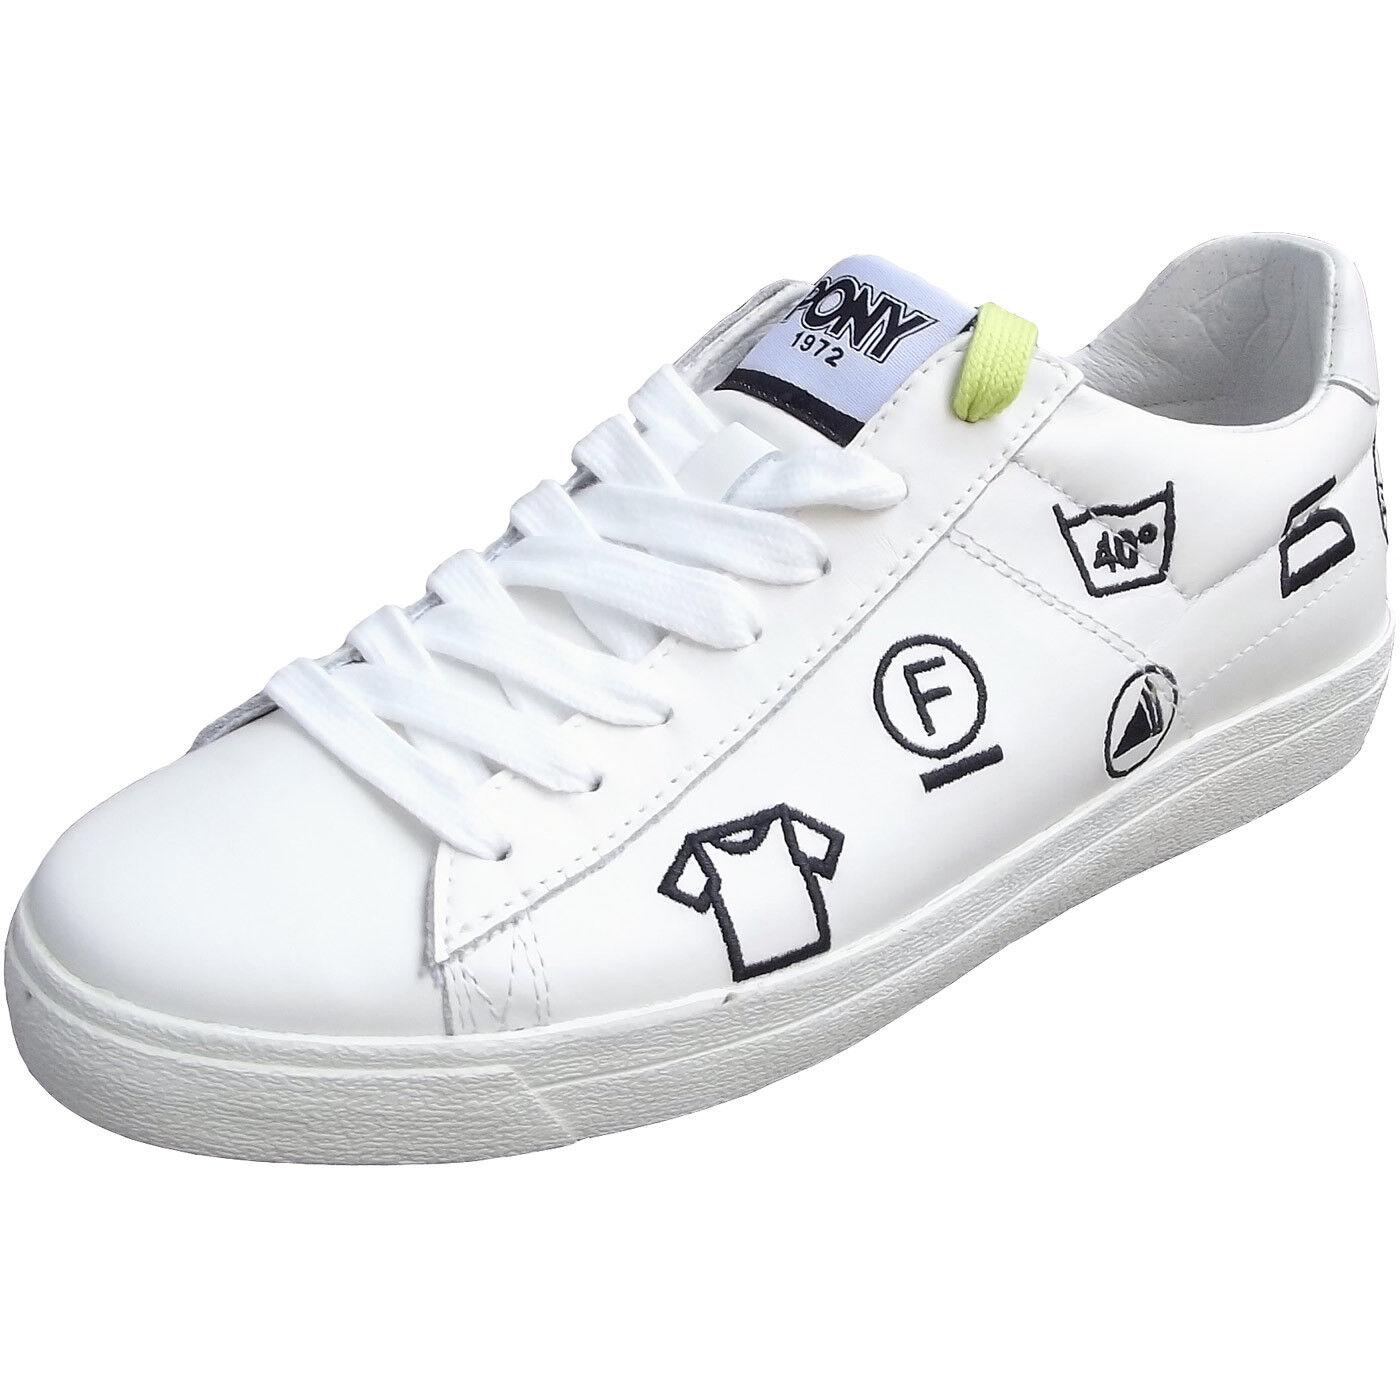 Pony Top Star Ox Damen Sneaker white